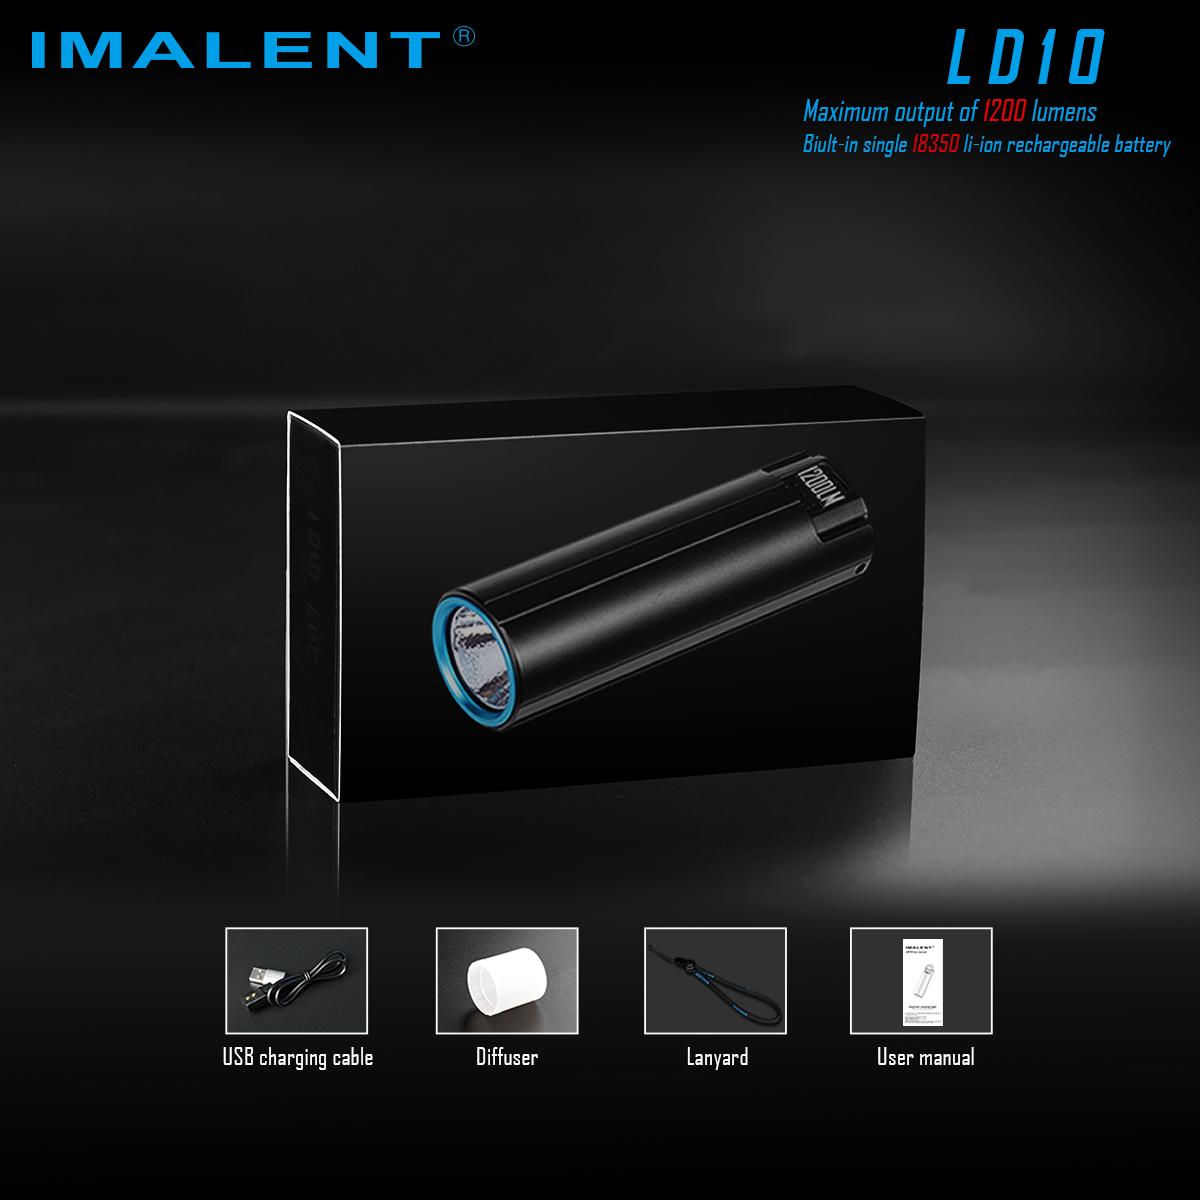 IMALENT LD10 XPL HI 5Modes 1200Lumens OLED Display Thumb-sized Keychain Flashlight